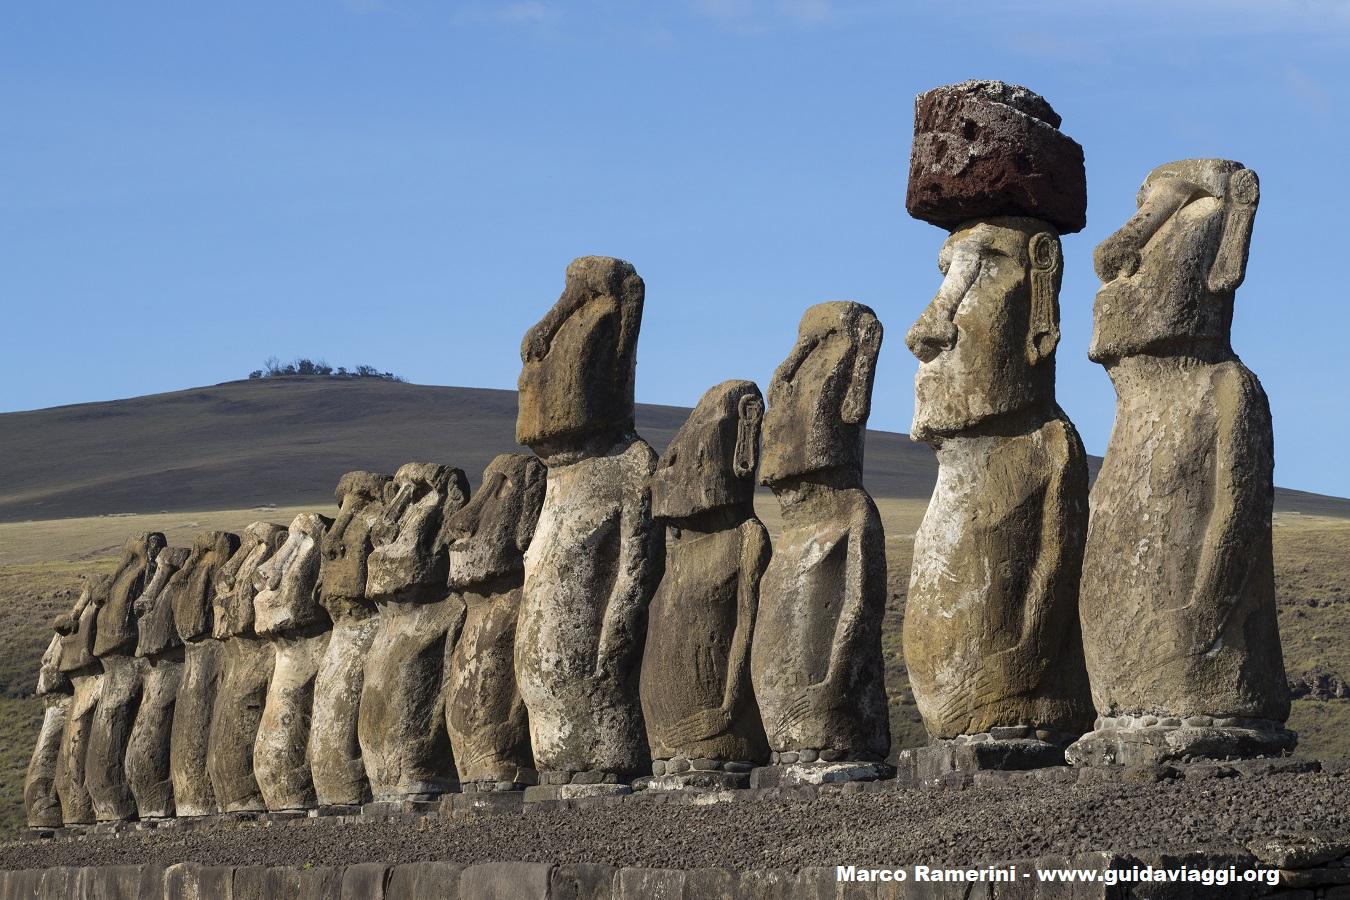 Ahu Tongariki, Ilha de Páscoa, Chile. Autor e Copyright Marco Ramerini.